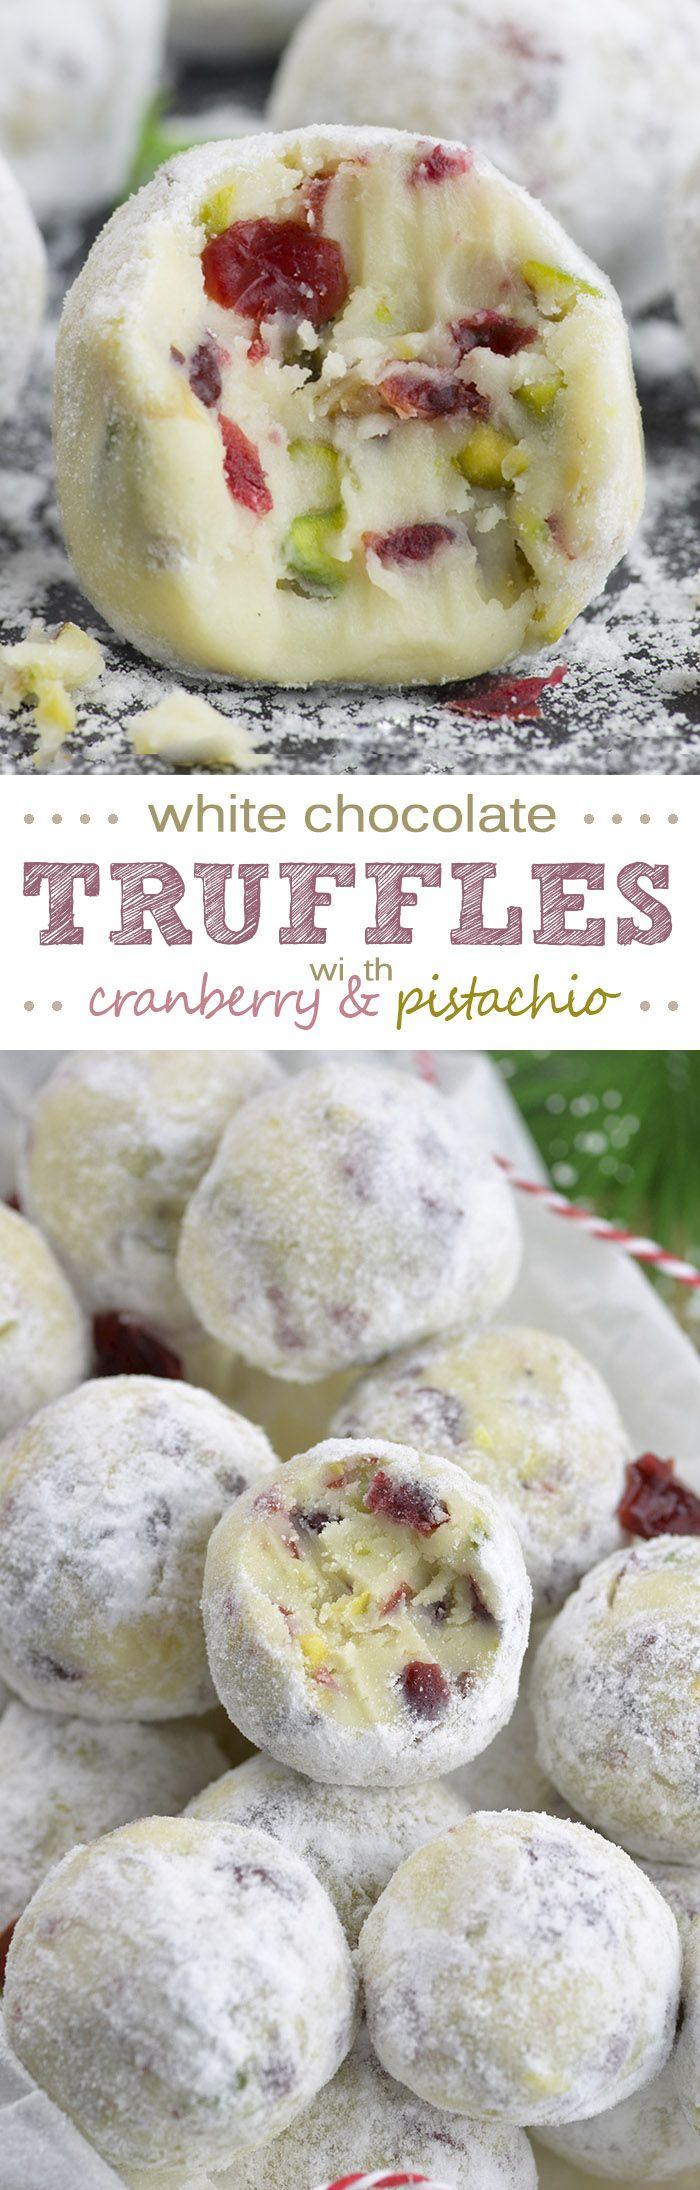 Cranberry Pistachio White Chocolate Truffles are super cute and festive no-bake de